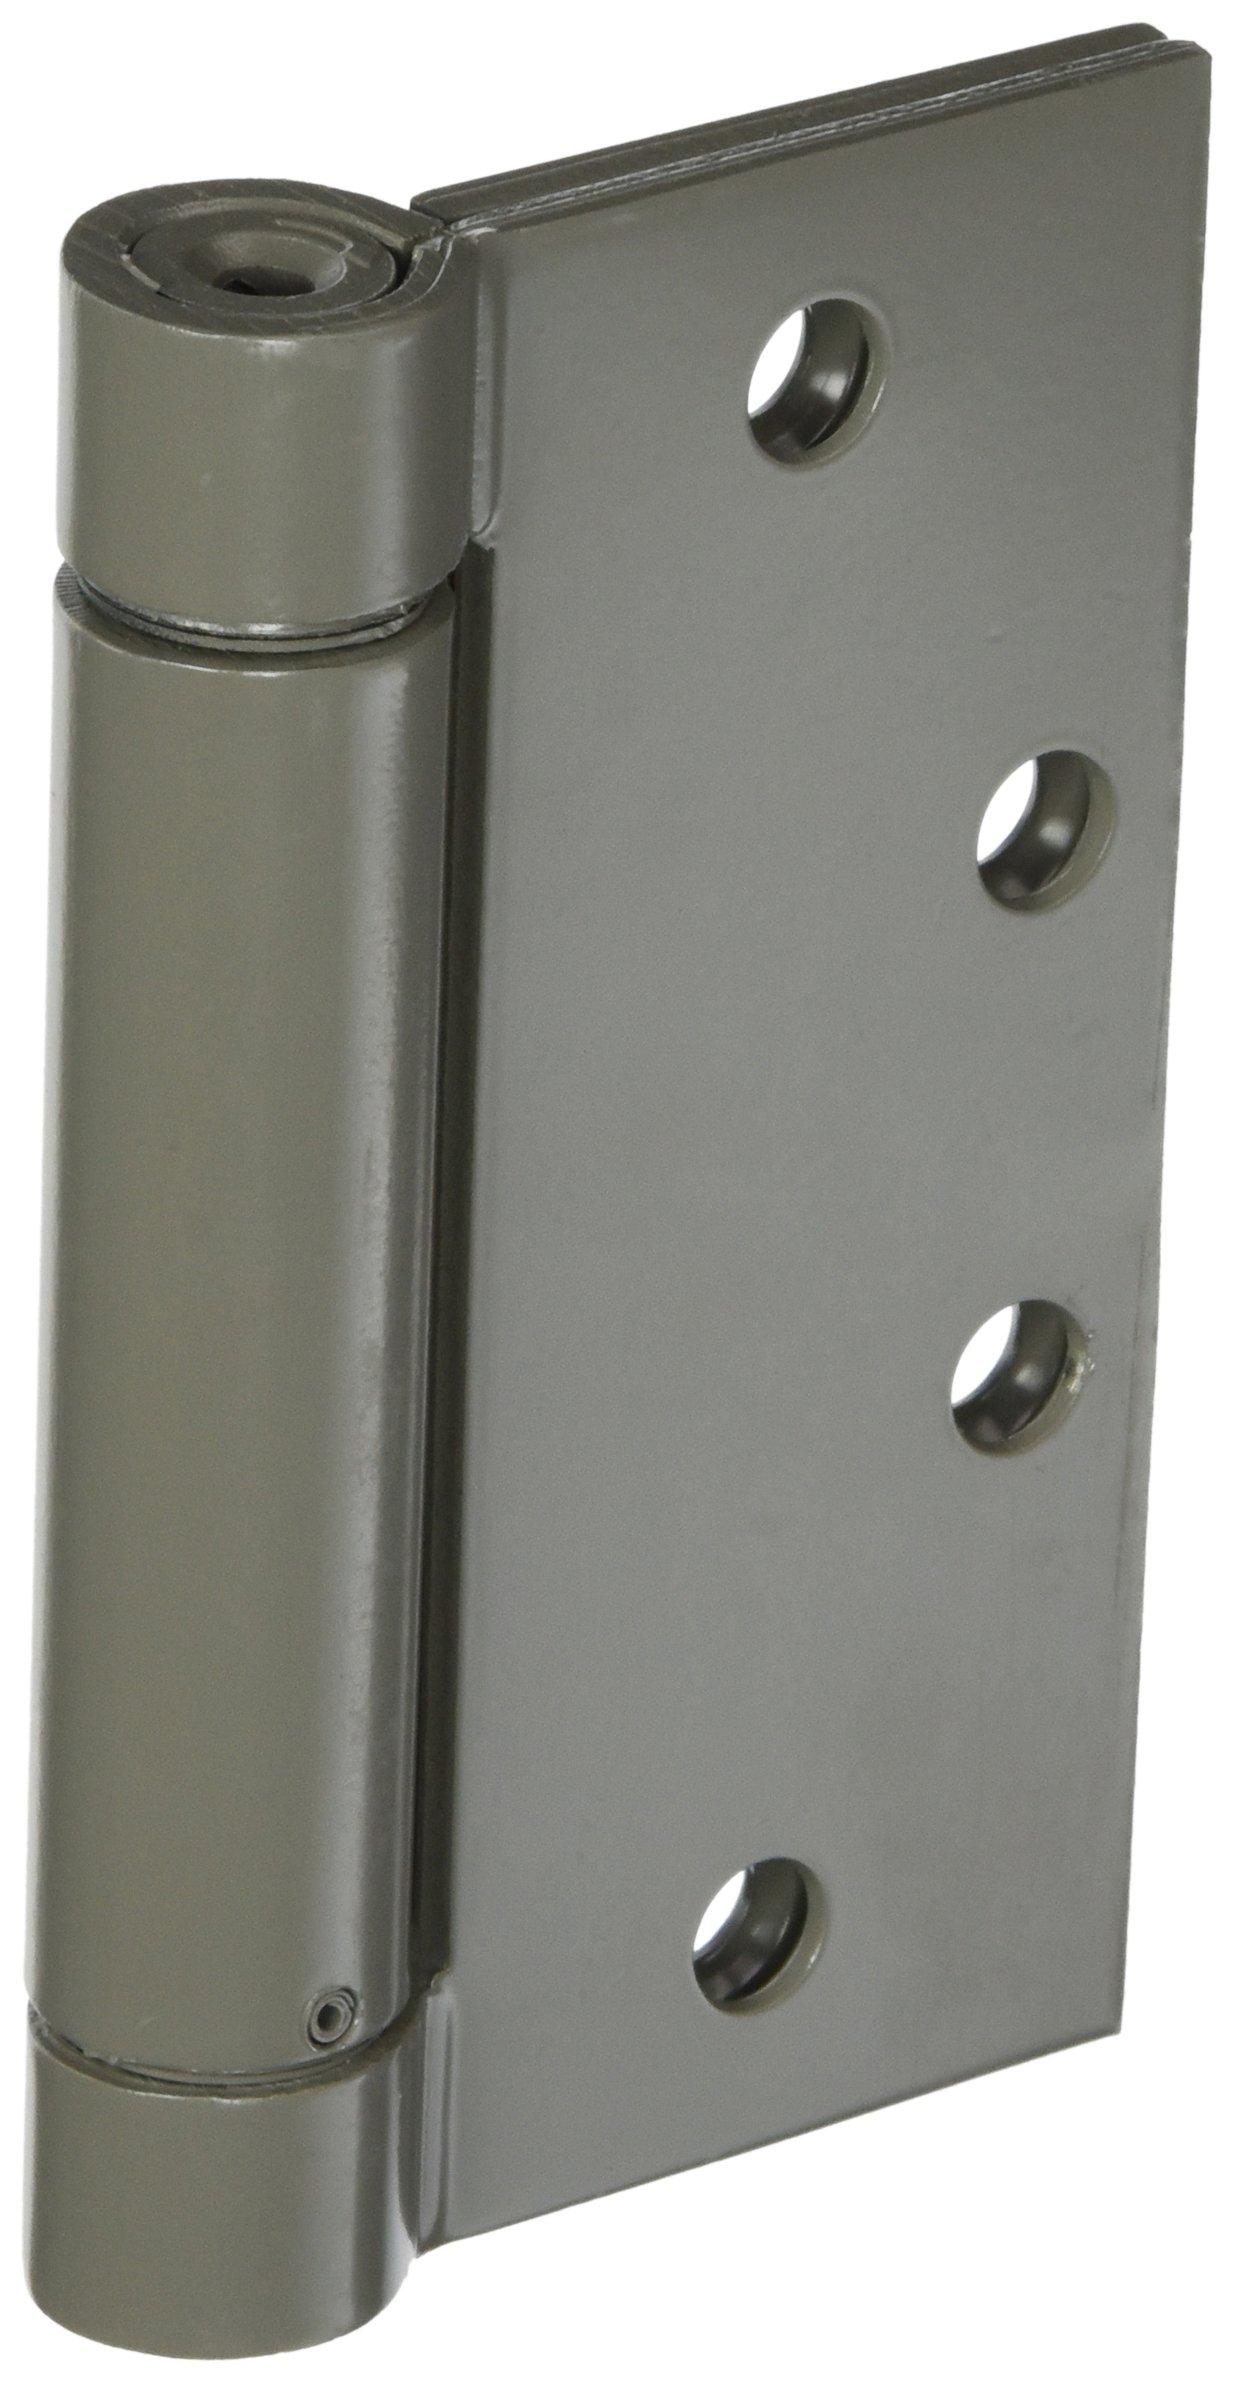 Stanley Hardware S420-836 2060 Spring Hinges in Prime Coat, 4-1/2 x 4-1/2